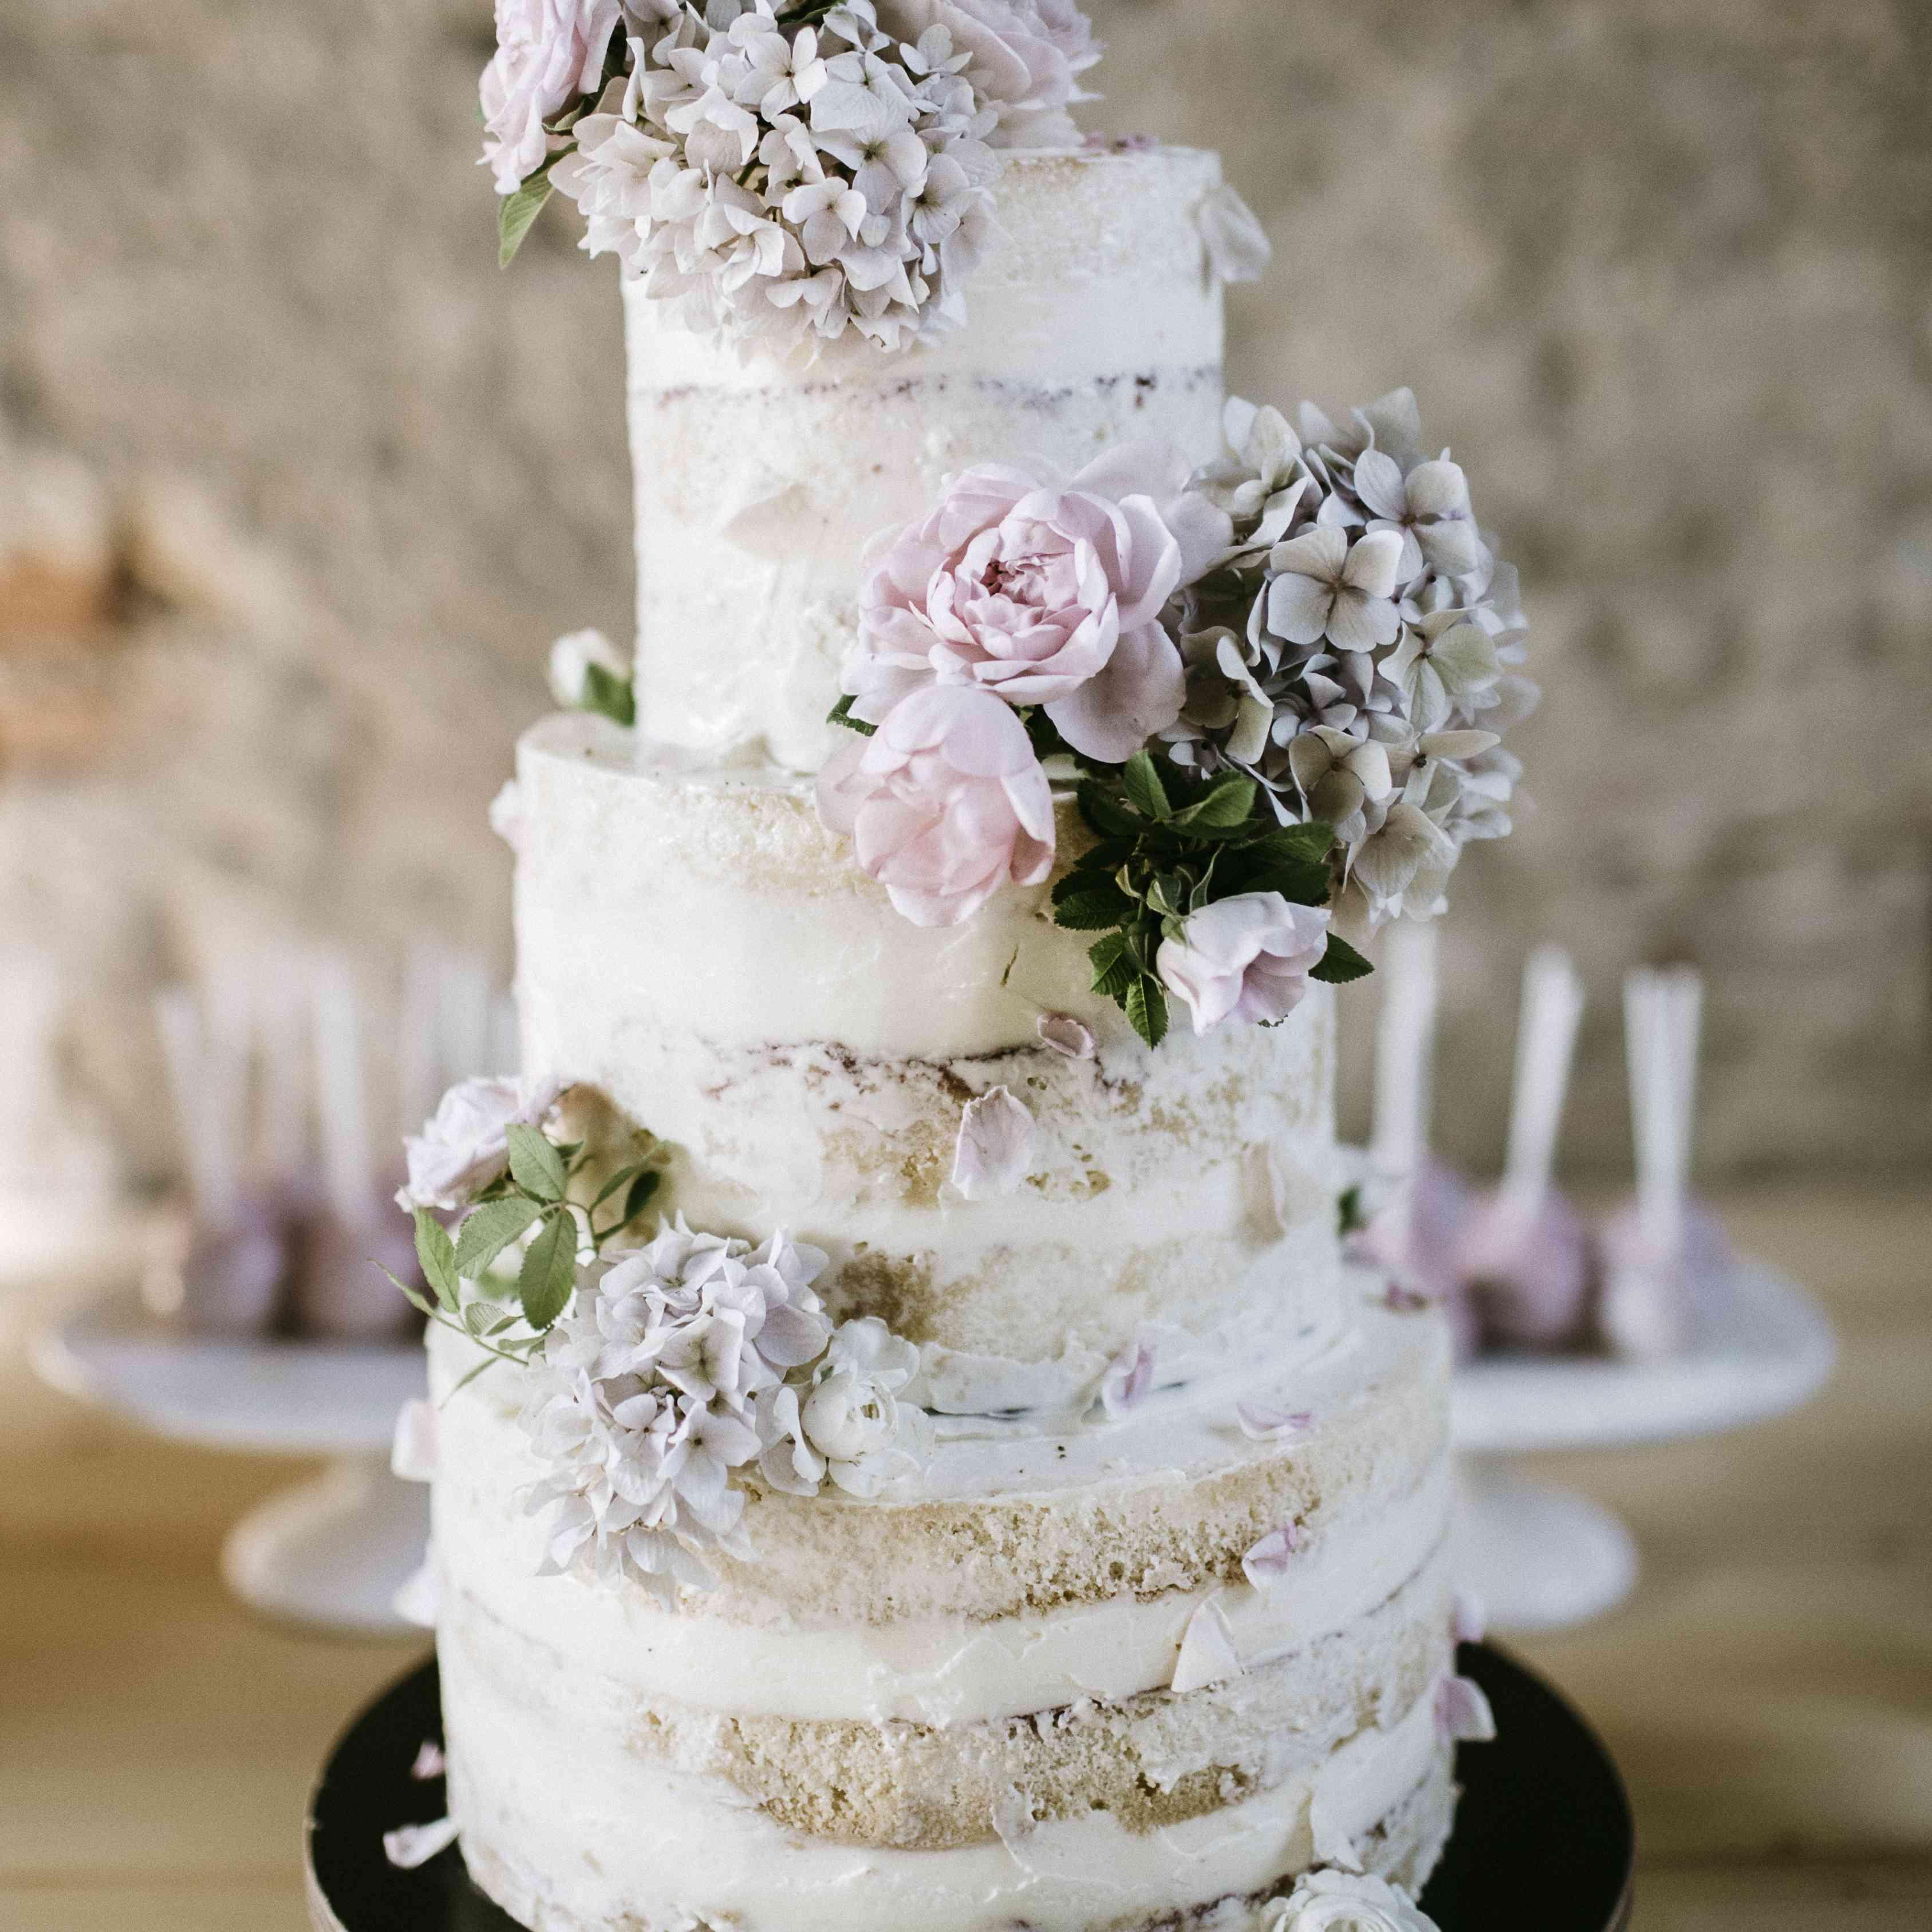 Rustic and Whimsical Naked Wedding Cake